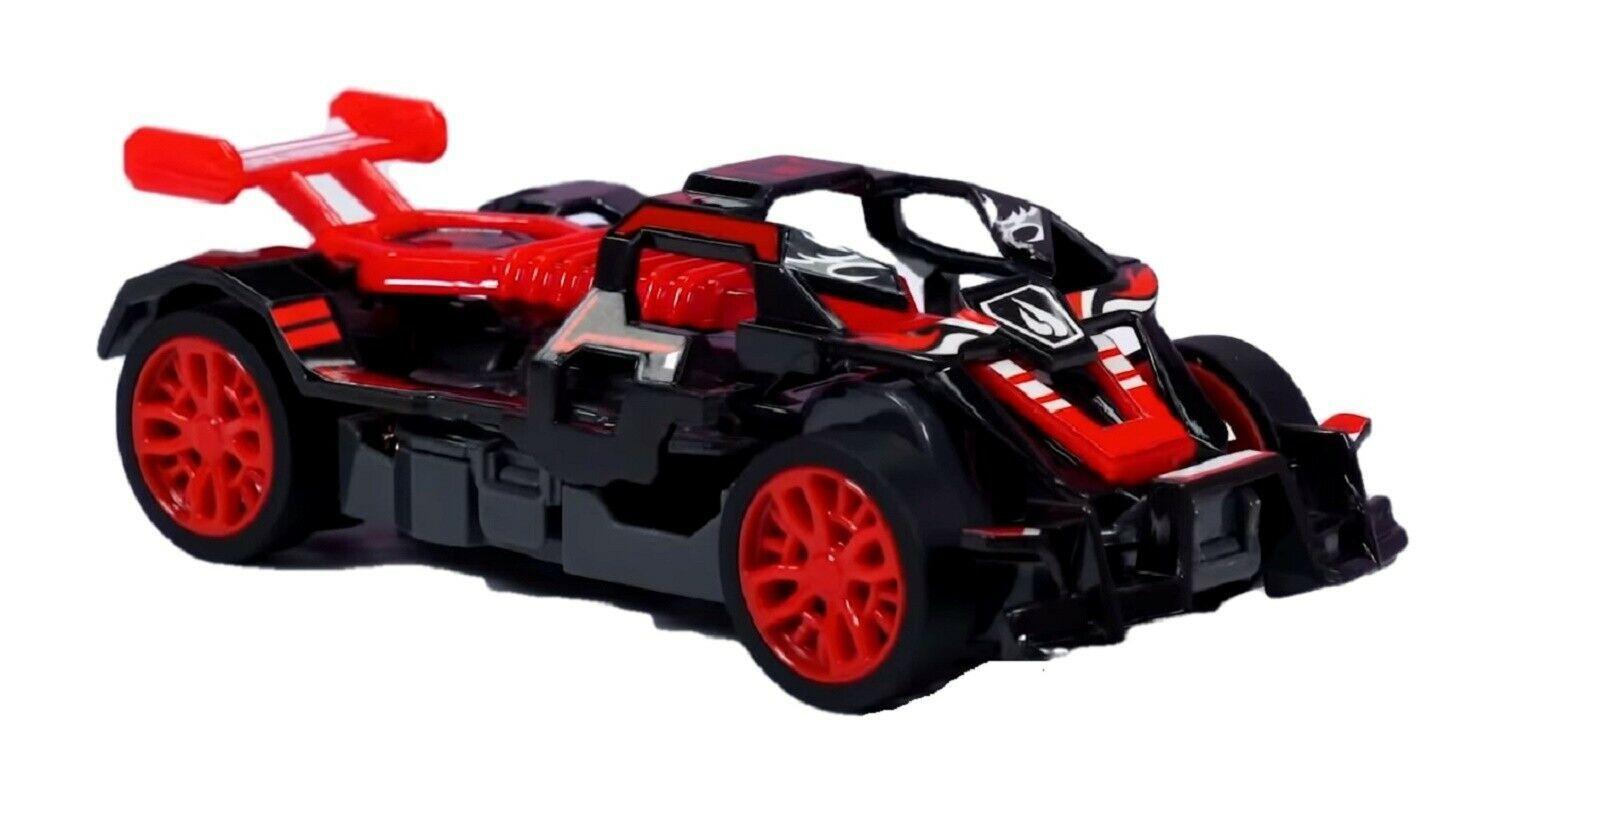 Bite Choicar Black Howling Racing Mini Car Vehicle Toy